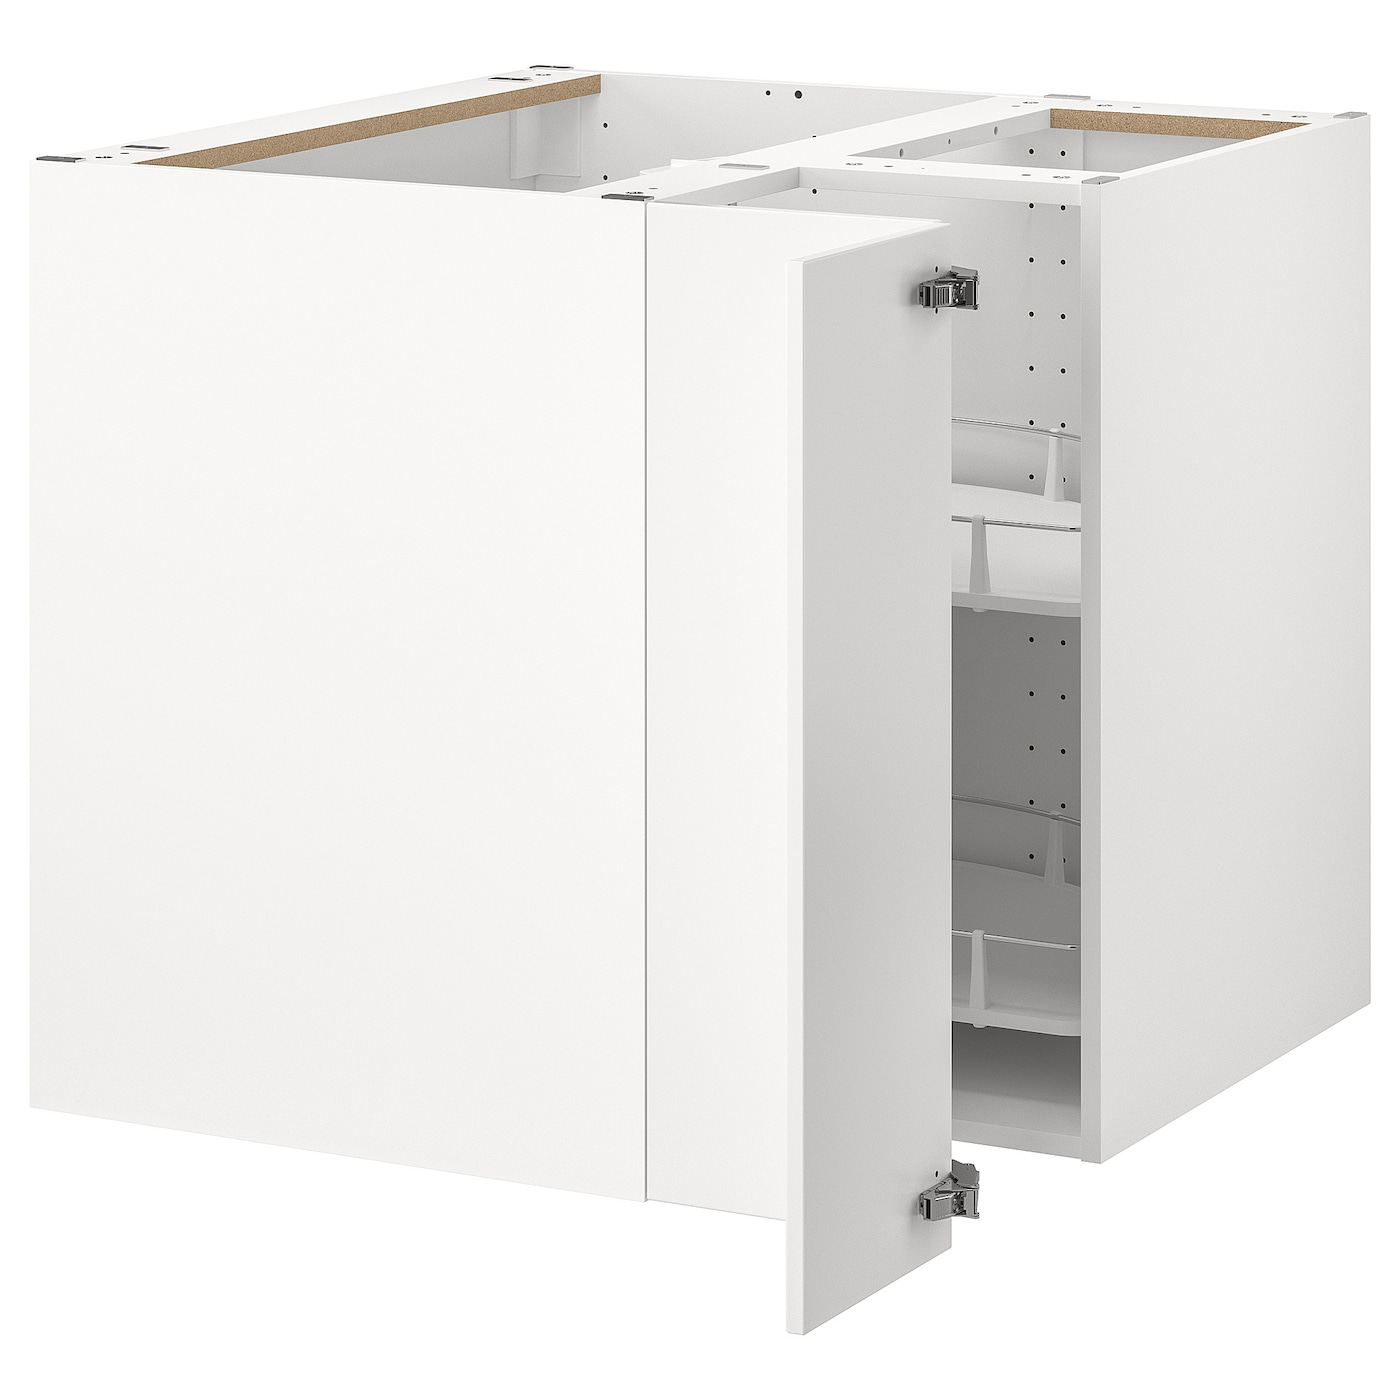 METOD Élément bas angle+rgt pivotant - blanc, Veddinge blanc 12x12 cm